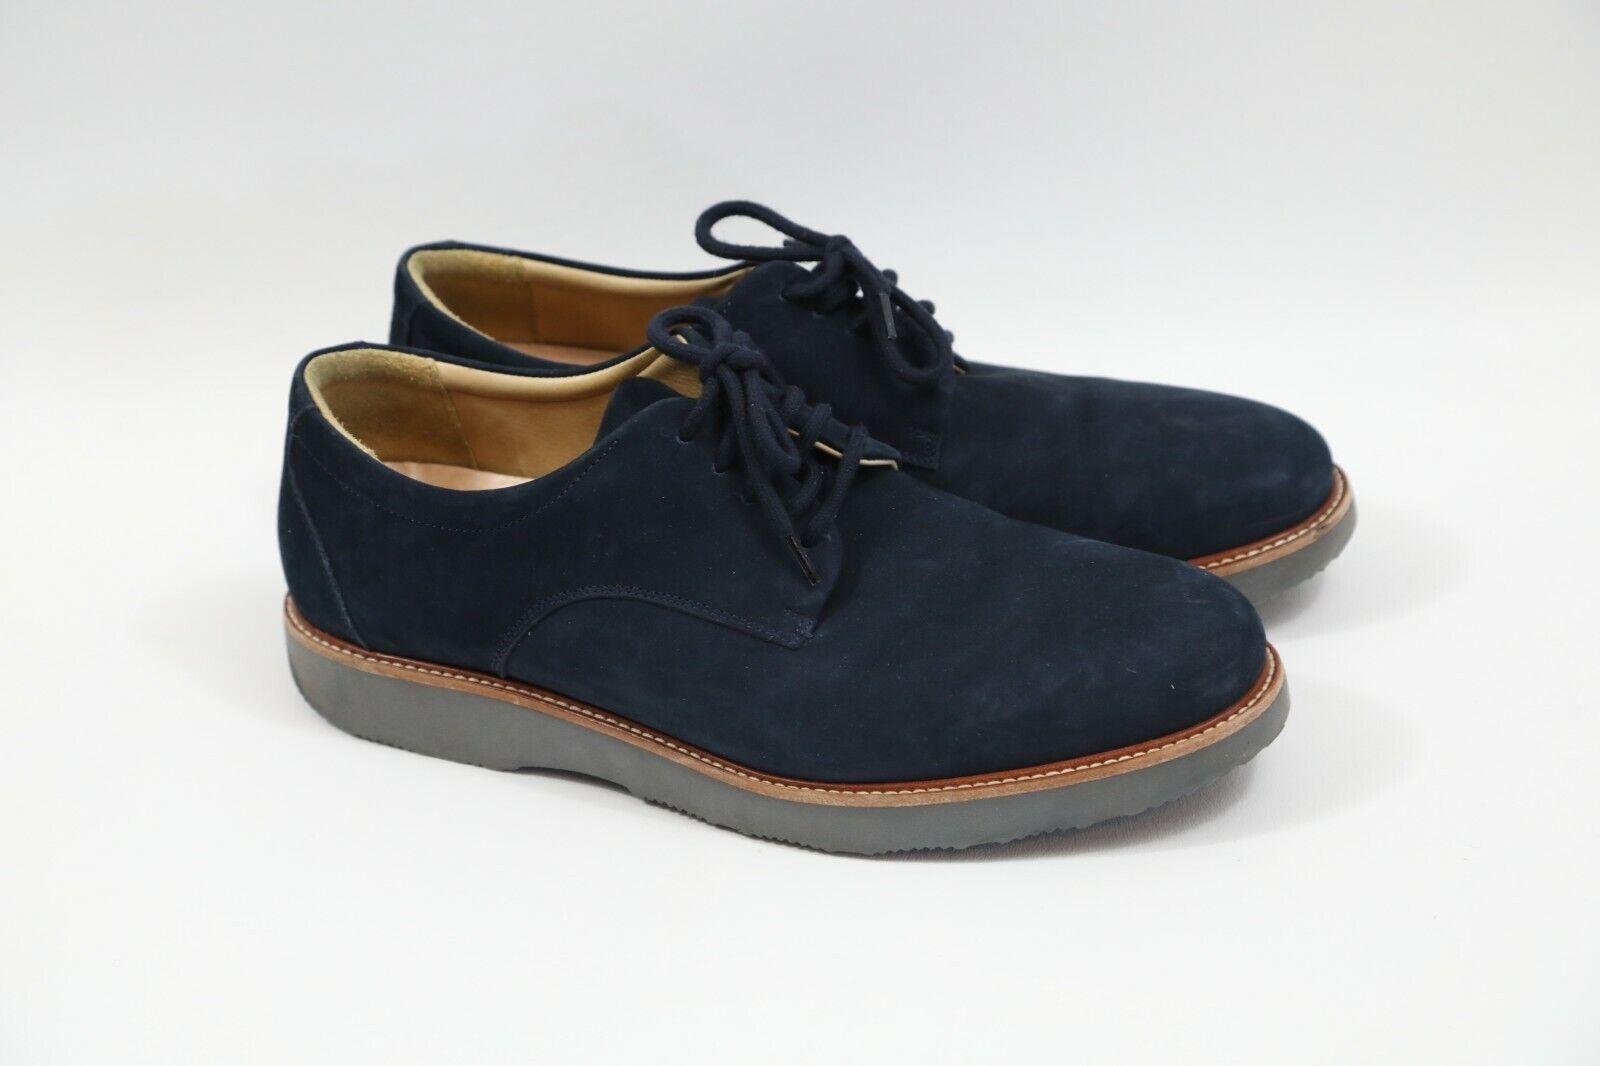 Samuel Samuel Samuel Hubbard Founder Oxford scarpe Dimensione 9.5 M 09deb1